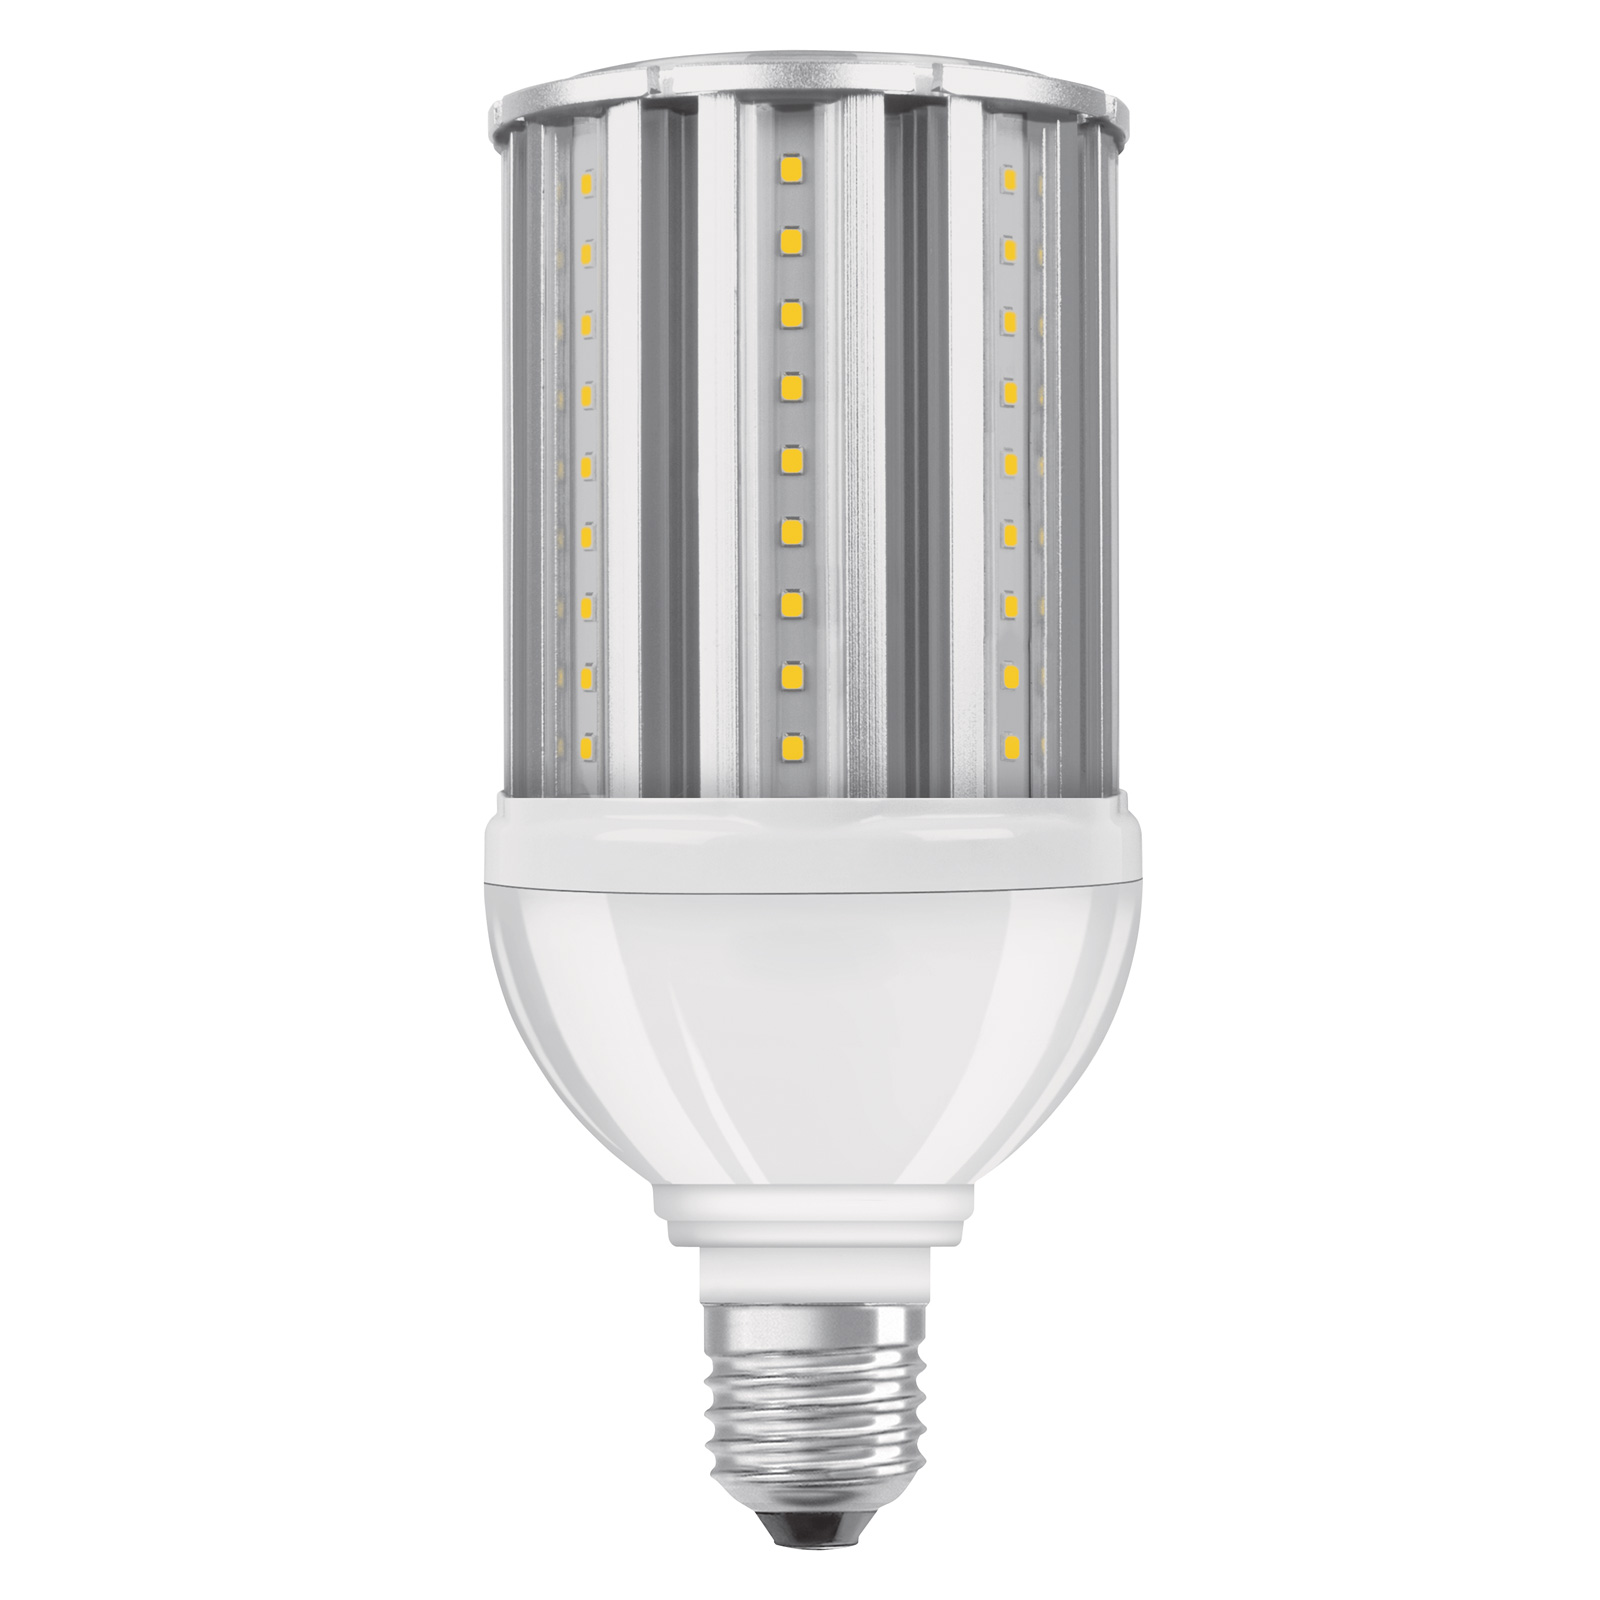 11076-OSRAM-Parathom-HQL-LED-Lampe-E27-27-Watt-3000-Lumen-neutral-white-4000-Kelvin-1 Wunderschöne Led Leuchtmittel E27 1000 Lumen Dekorationen